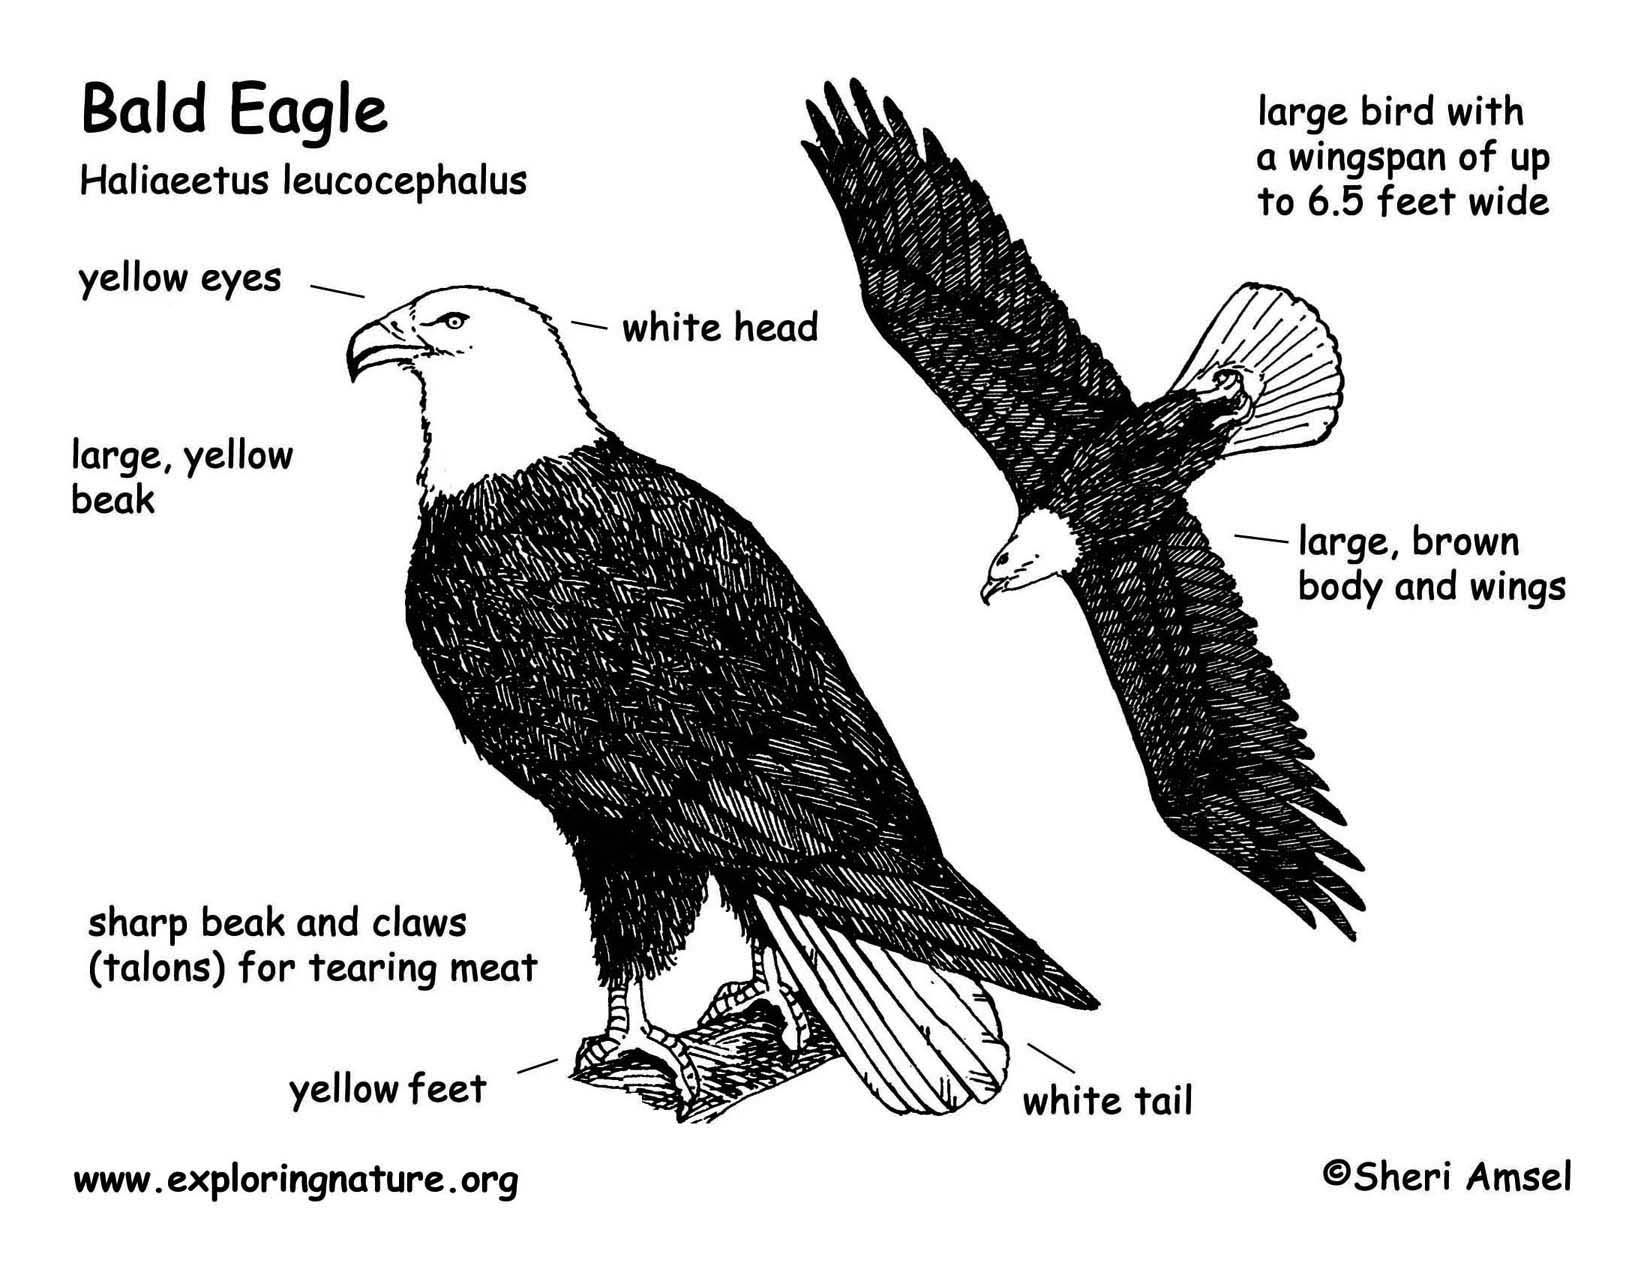 1000 images about wings like eagles on pinterest golden eagle  : bald eagle diagram - findchart.co